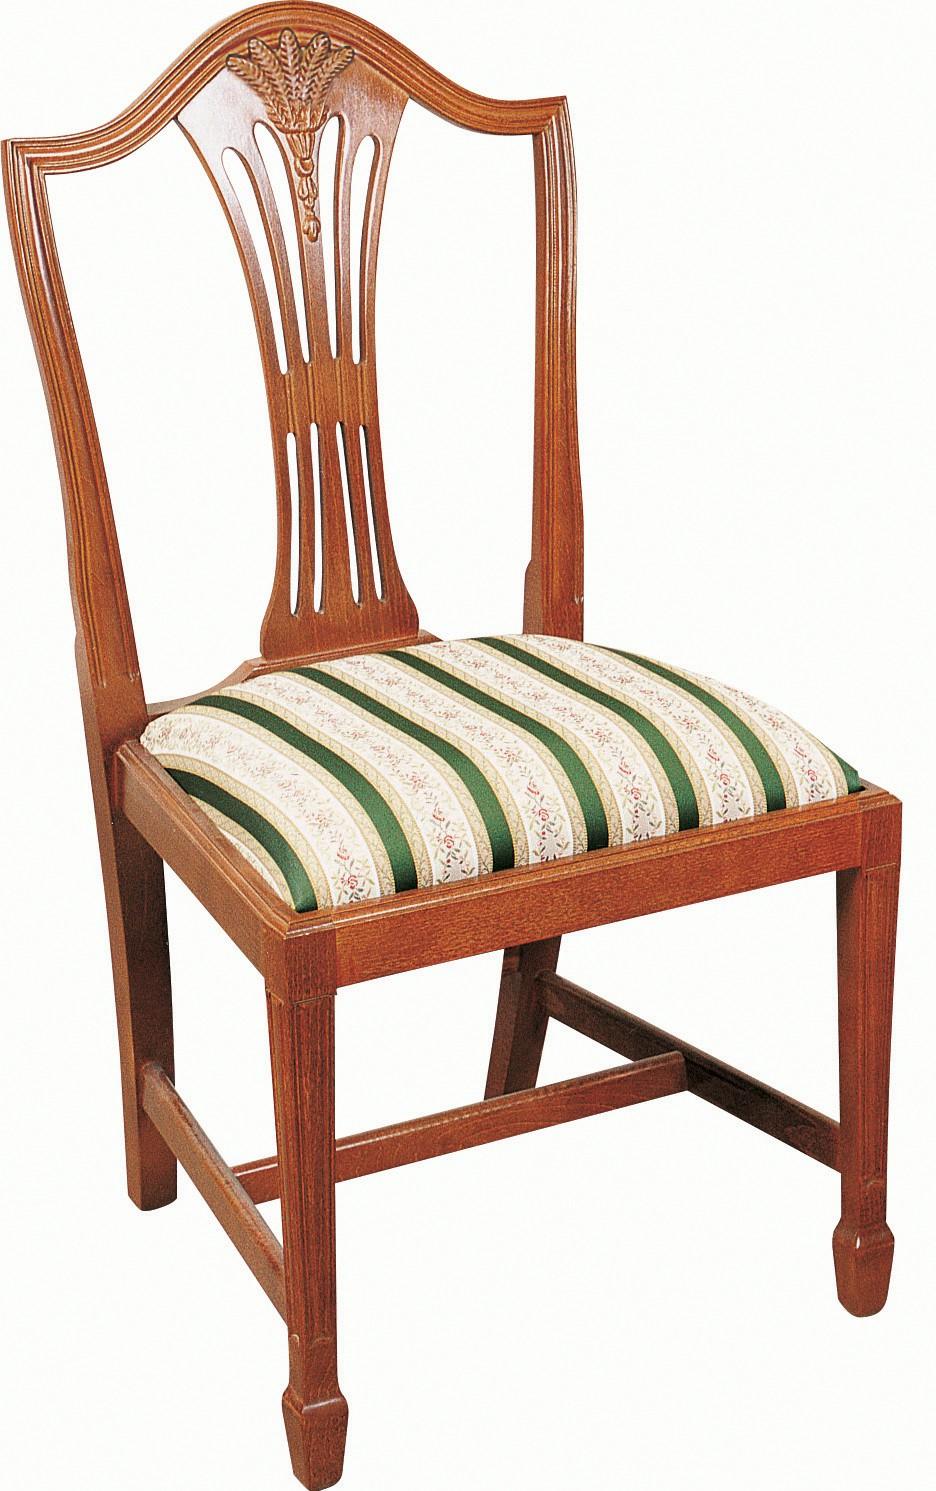 Genial Hepplewhite Wheatear Chair